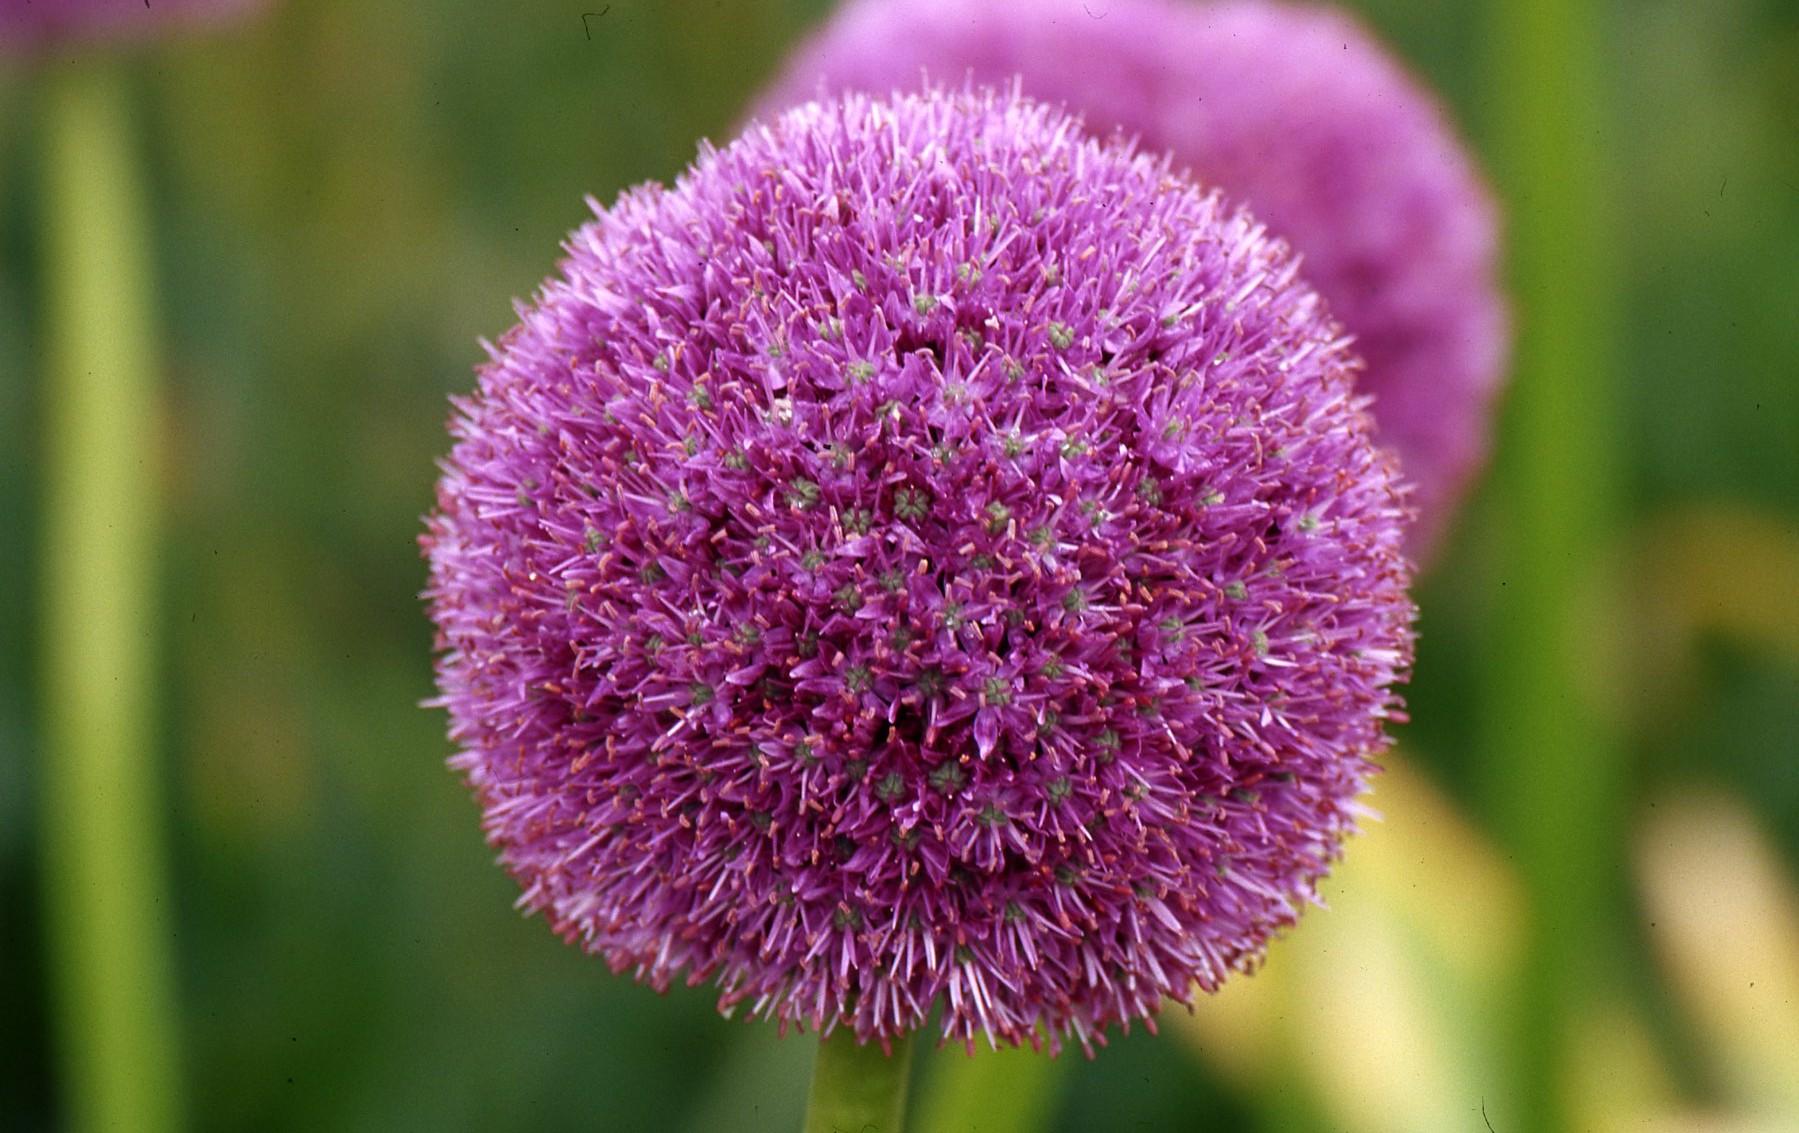 Allium Giganteum from the Gold Medal winning Harts Nursery